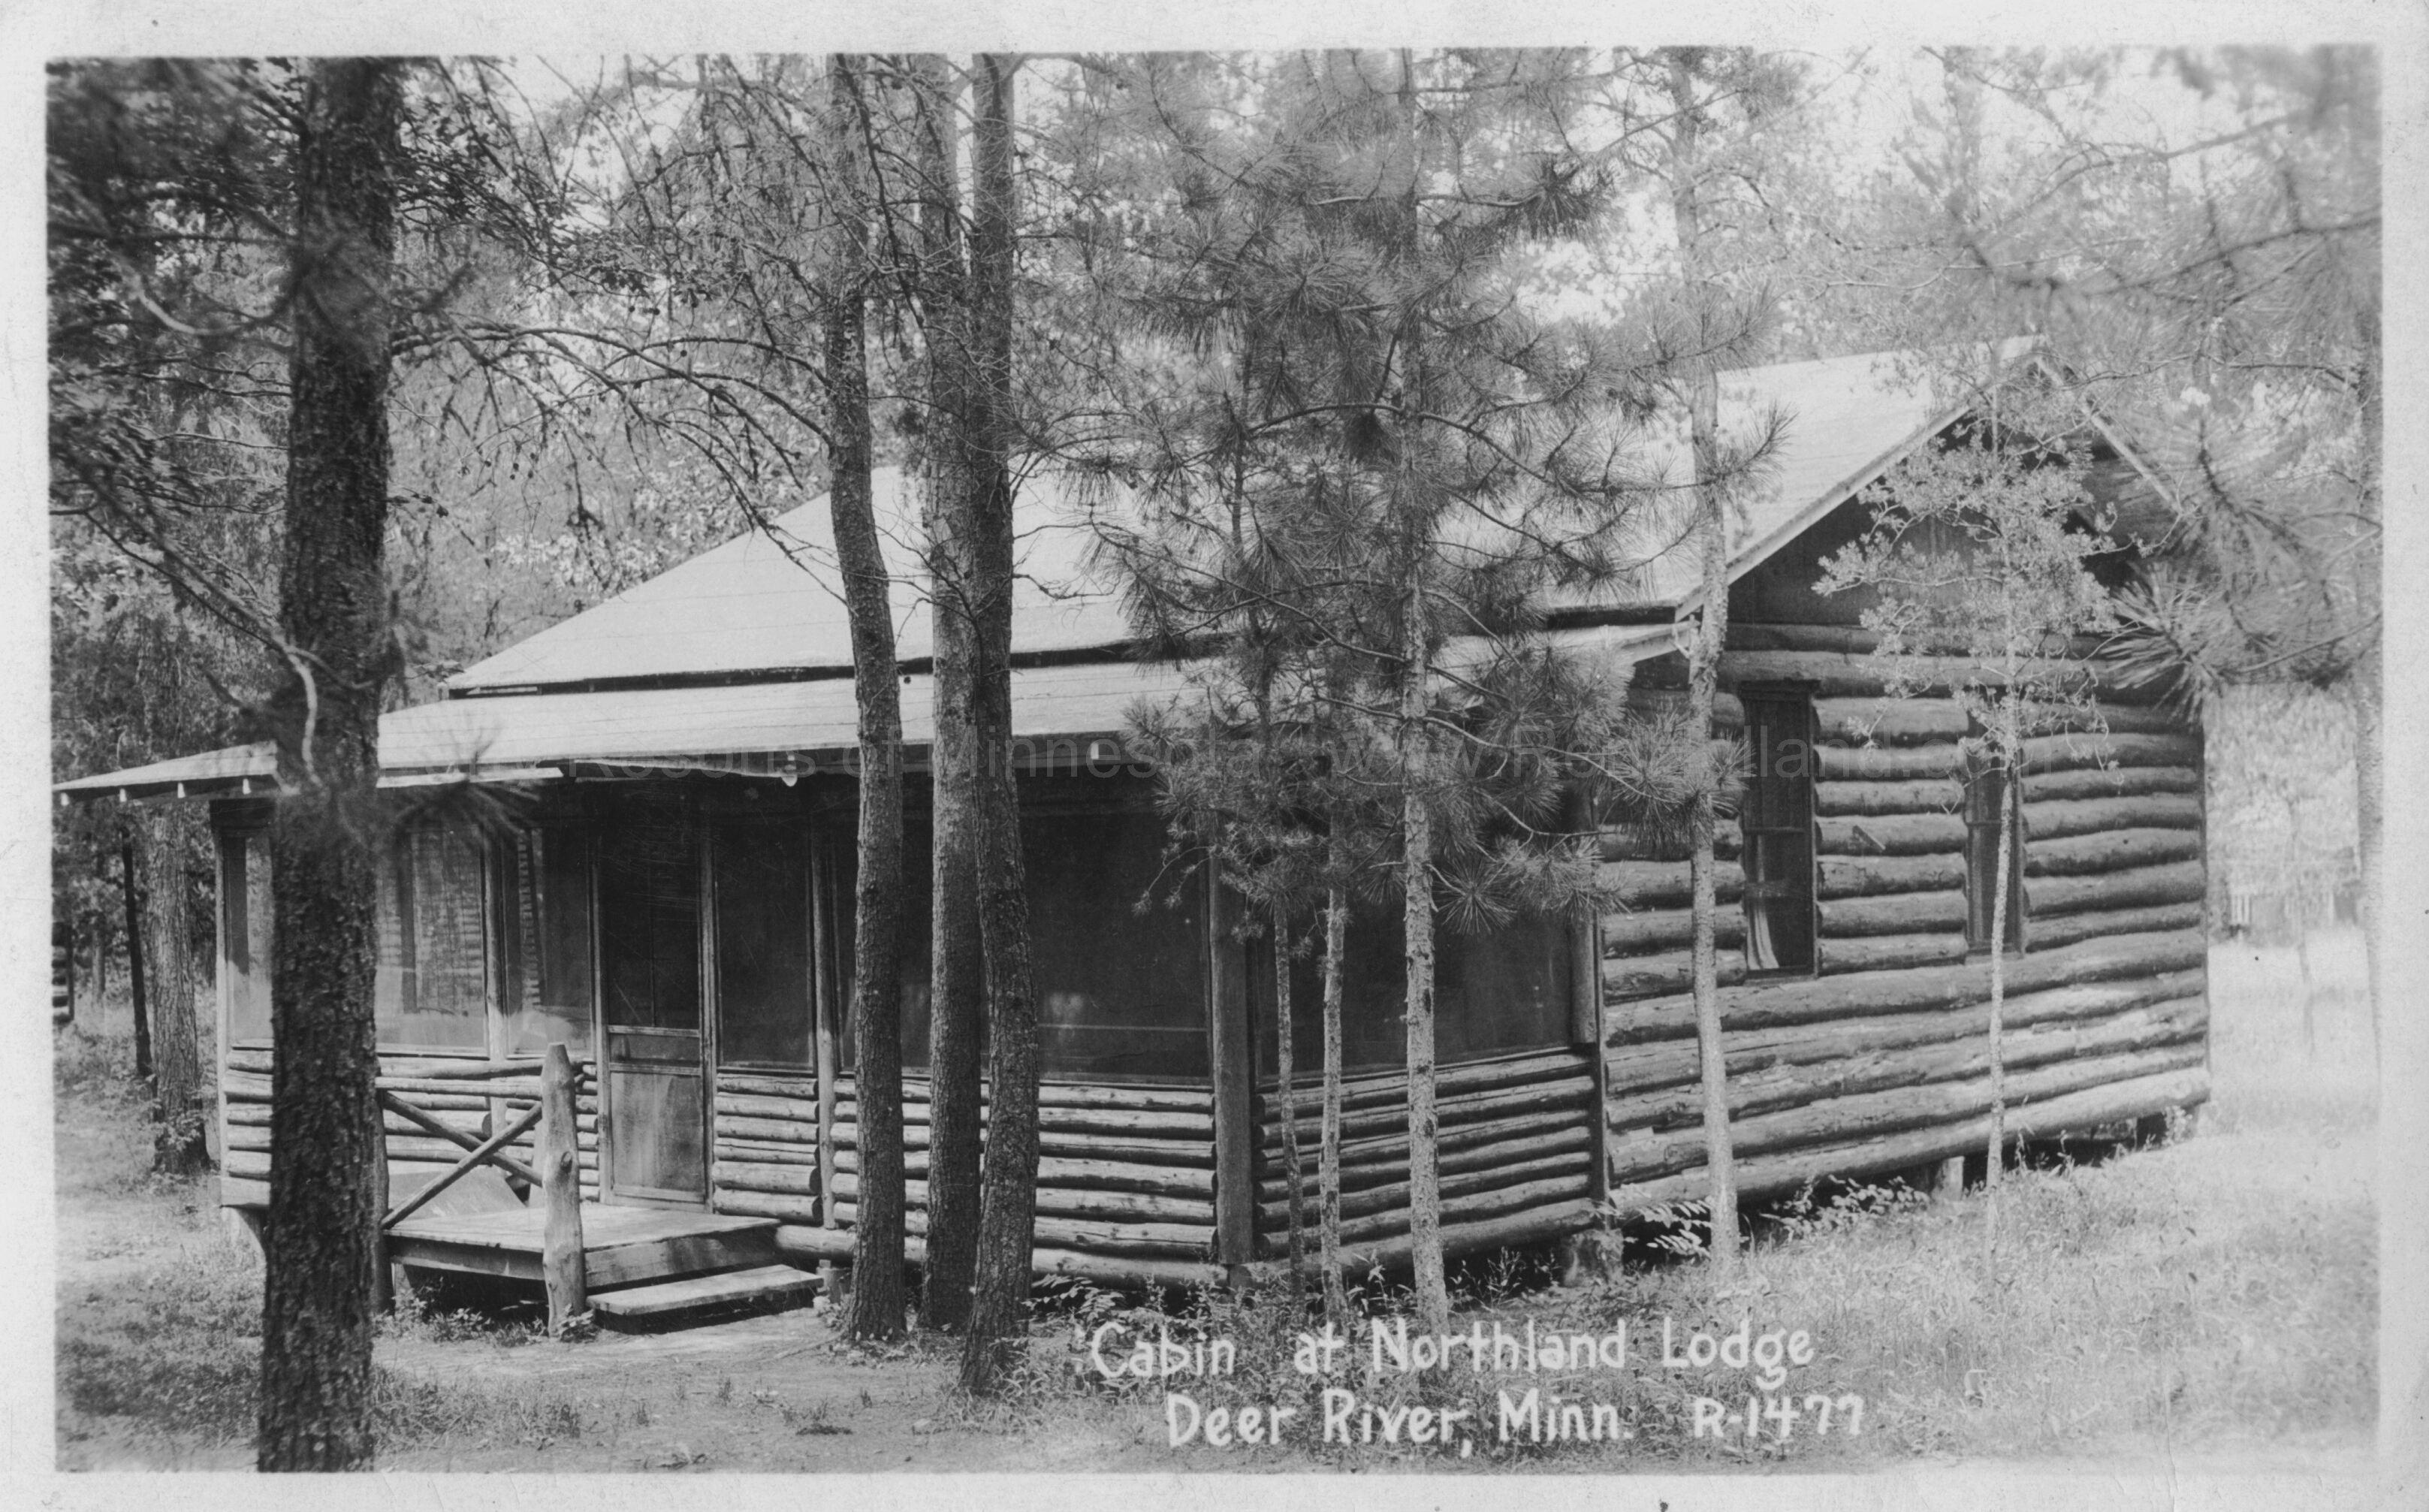 ... 18A Northland Lodge Cabin, Lake Winnibigoshish, Ca 1930 ...